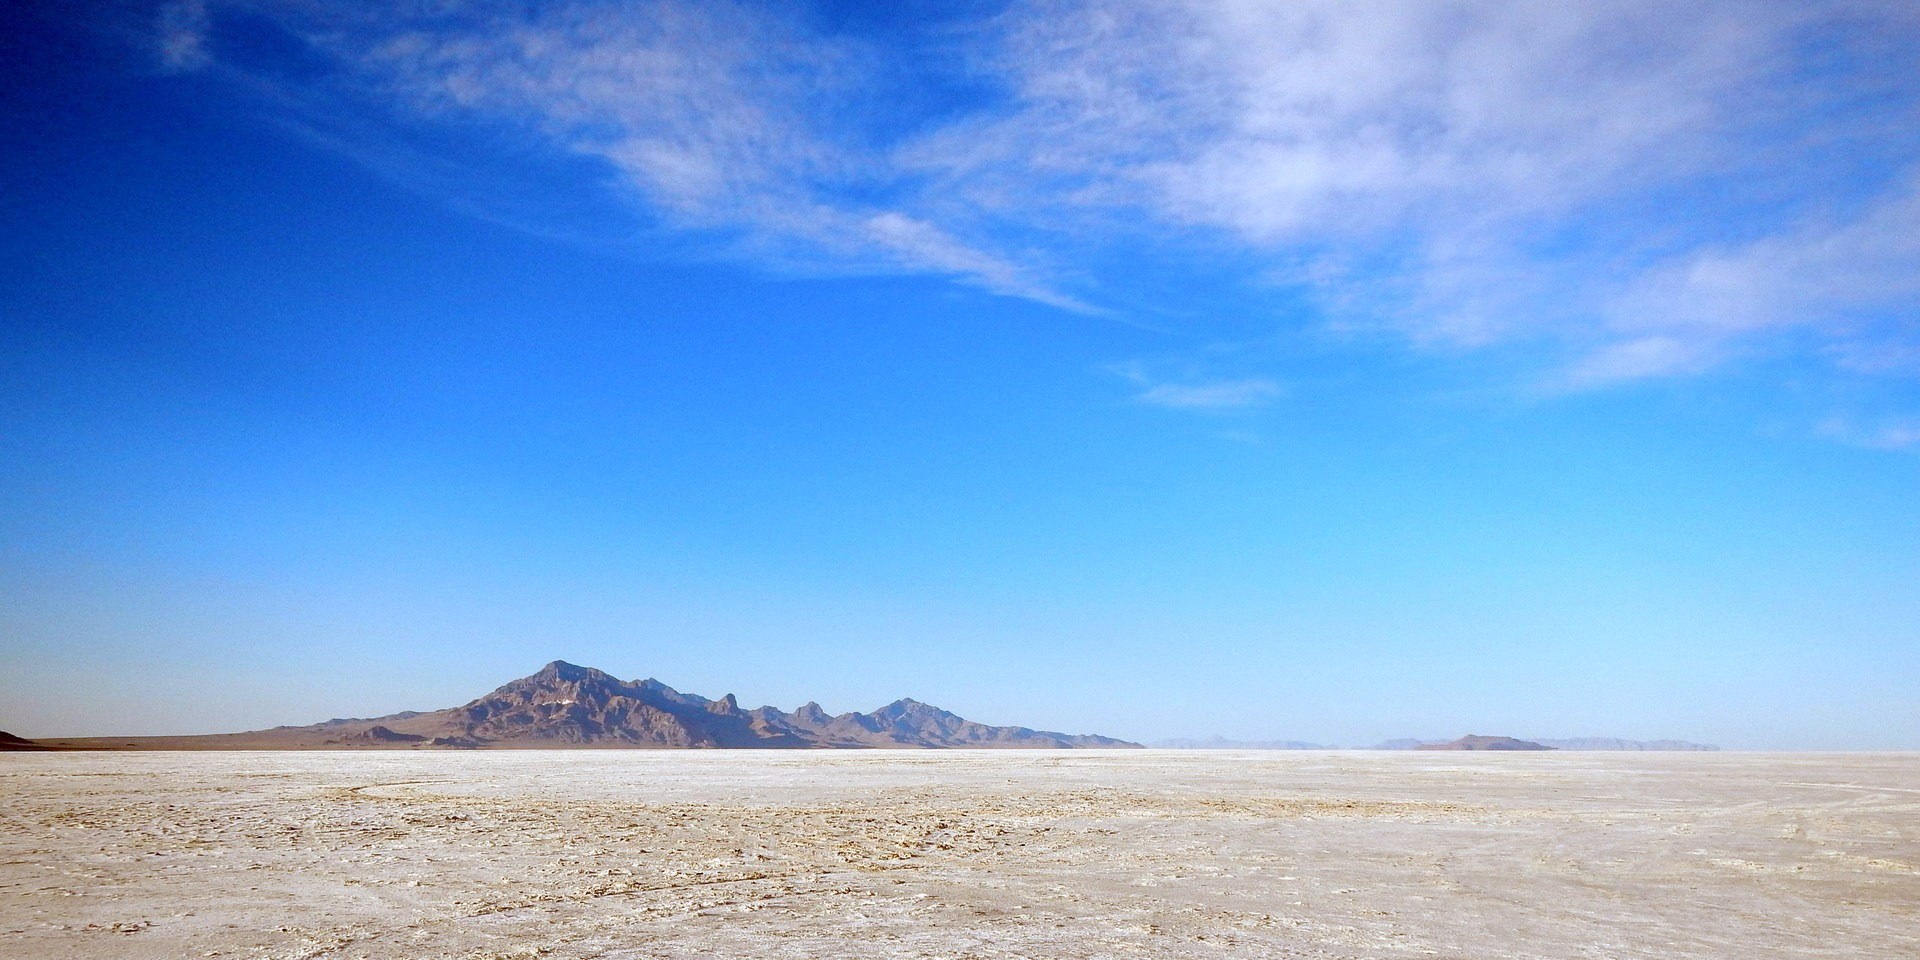 Bonneville Salt Flats | Outdoor Project